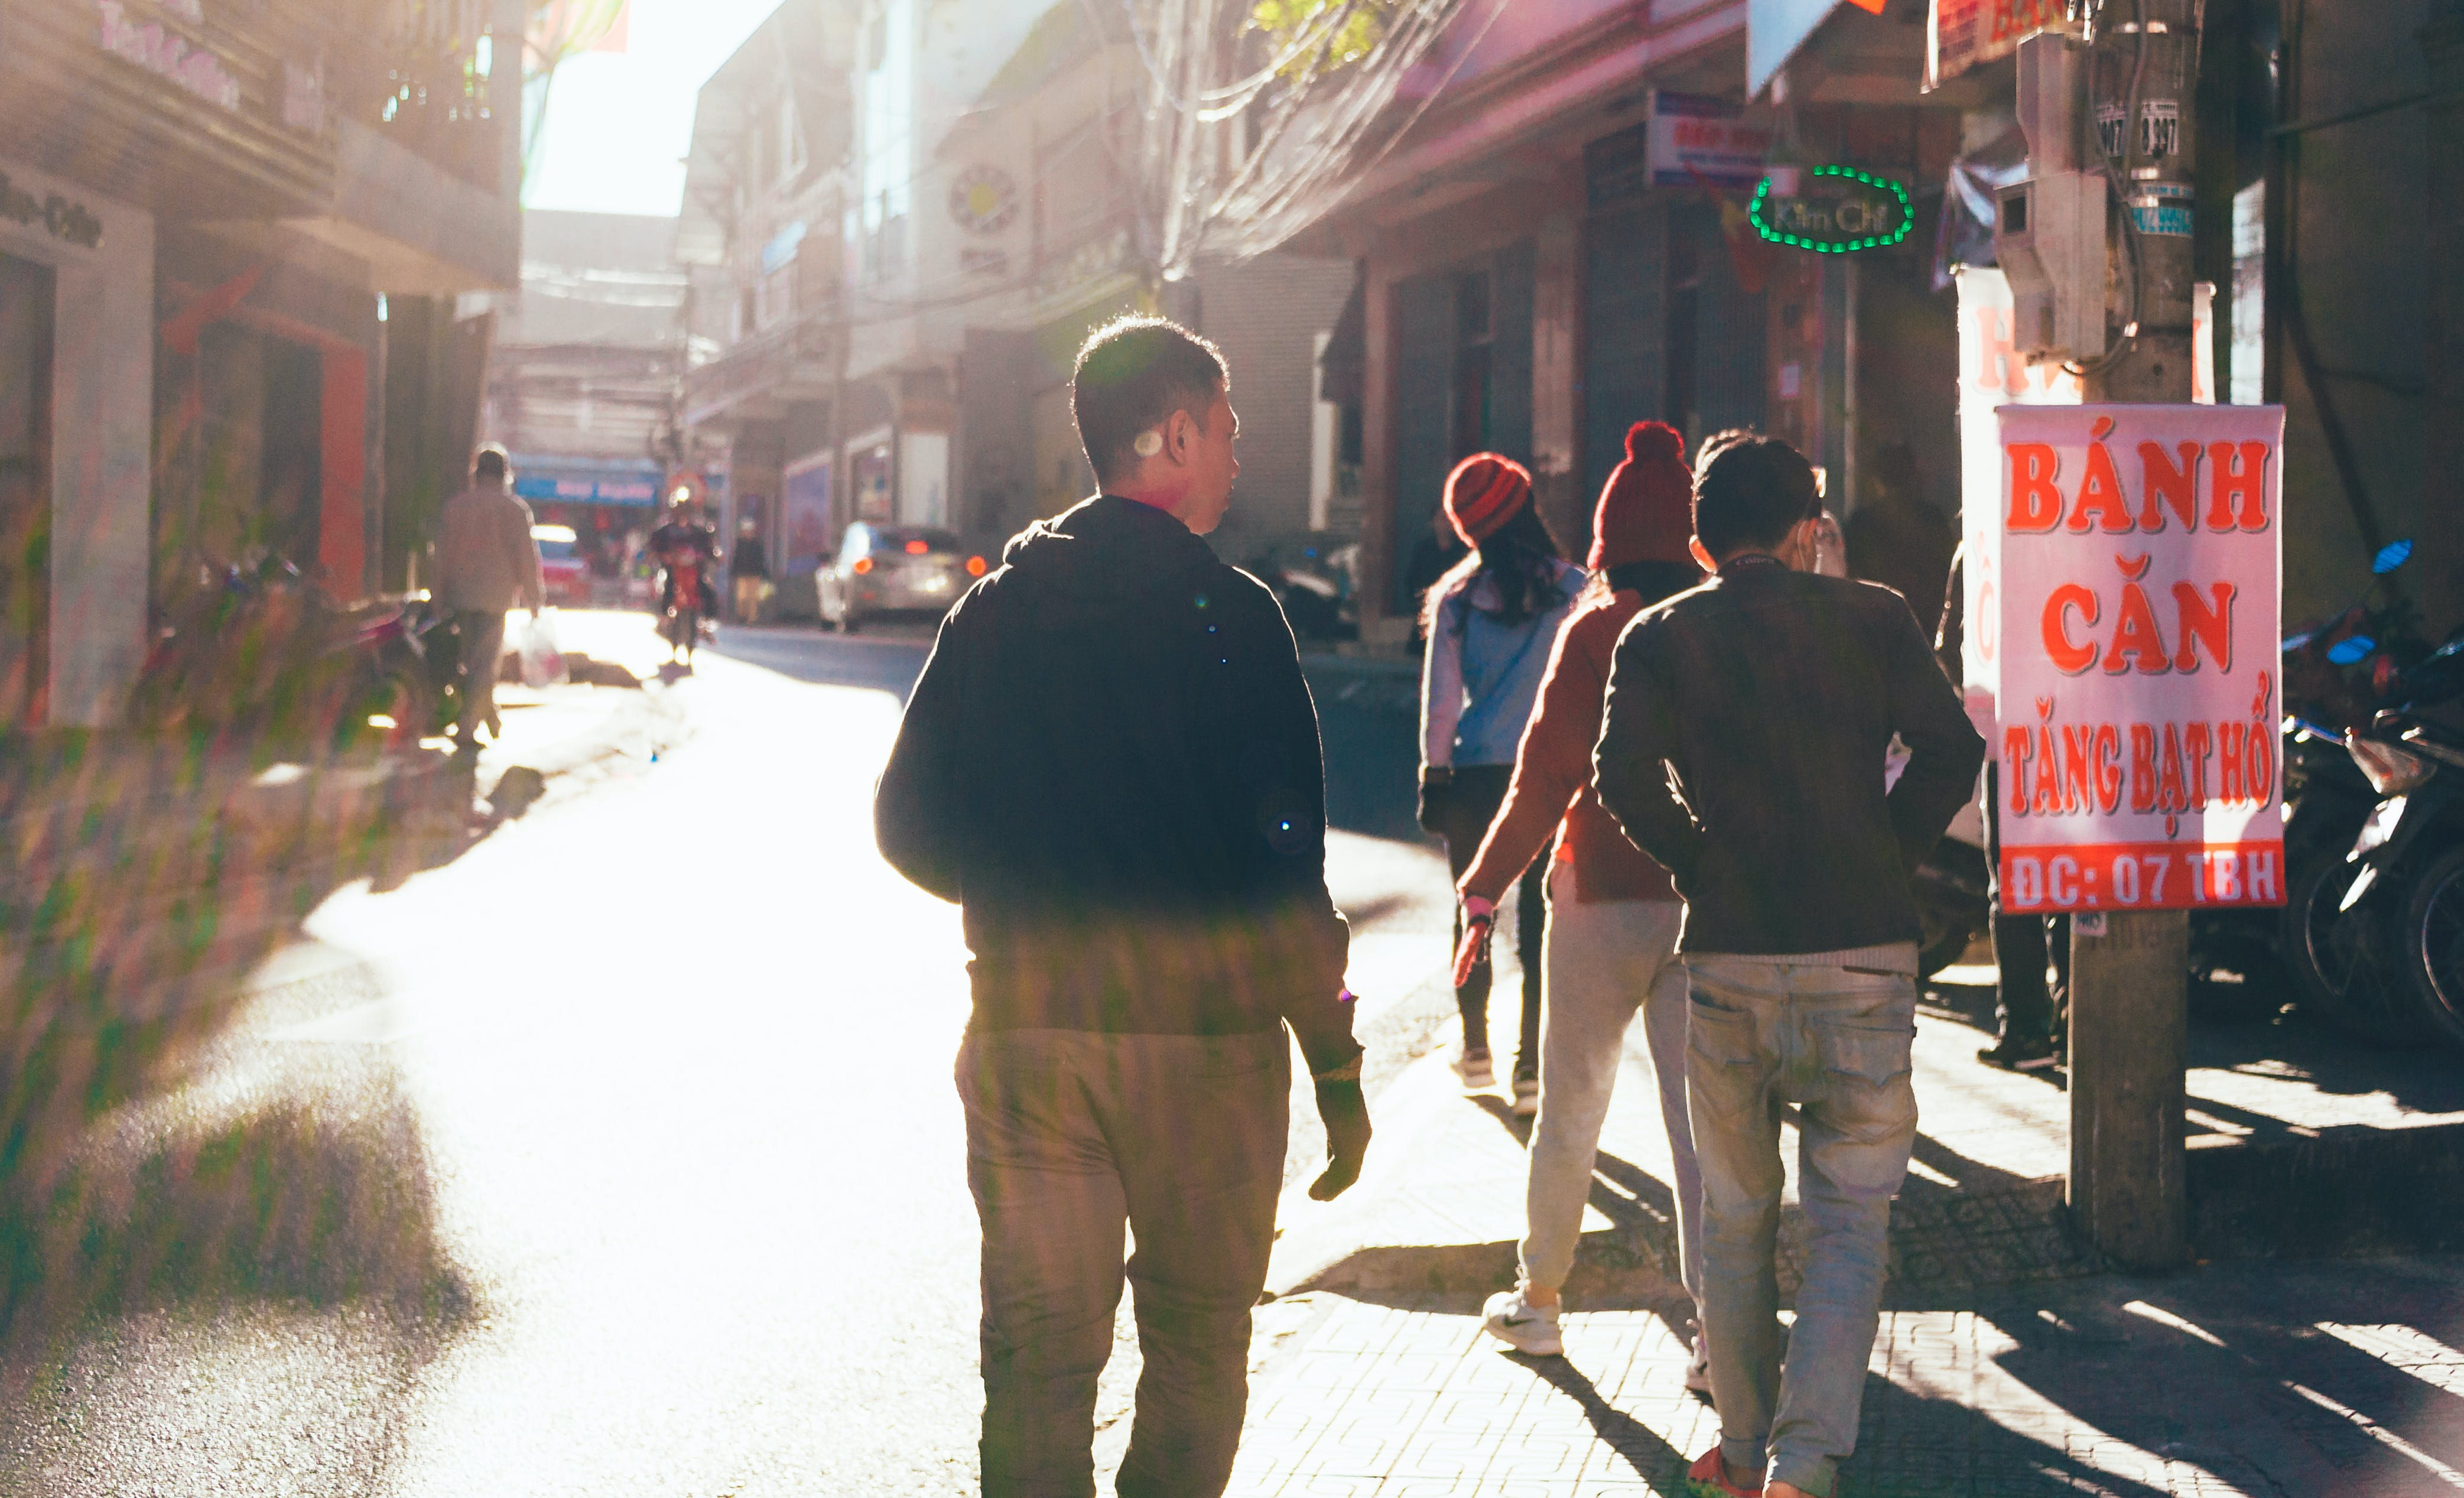 People Walking on Street